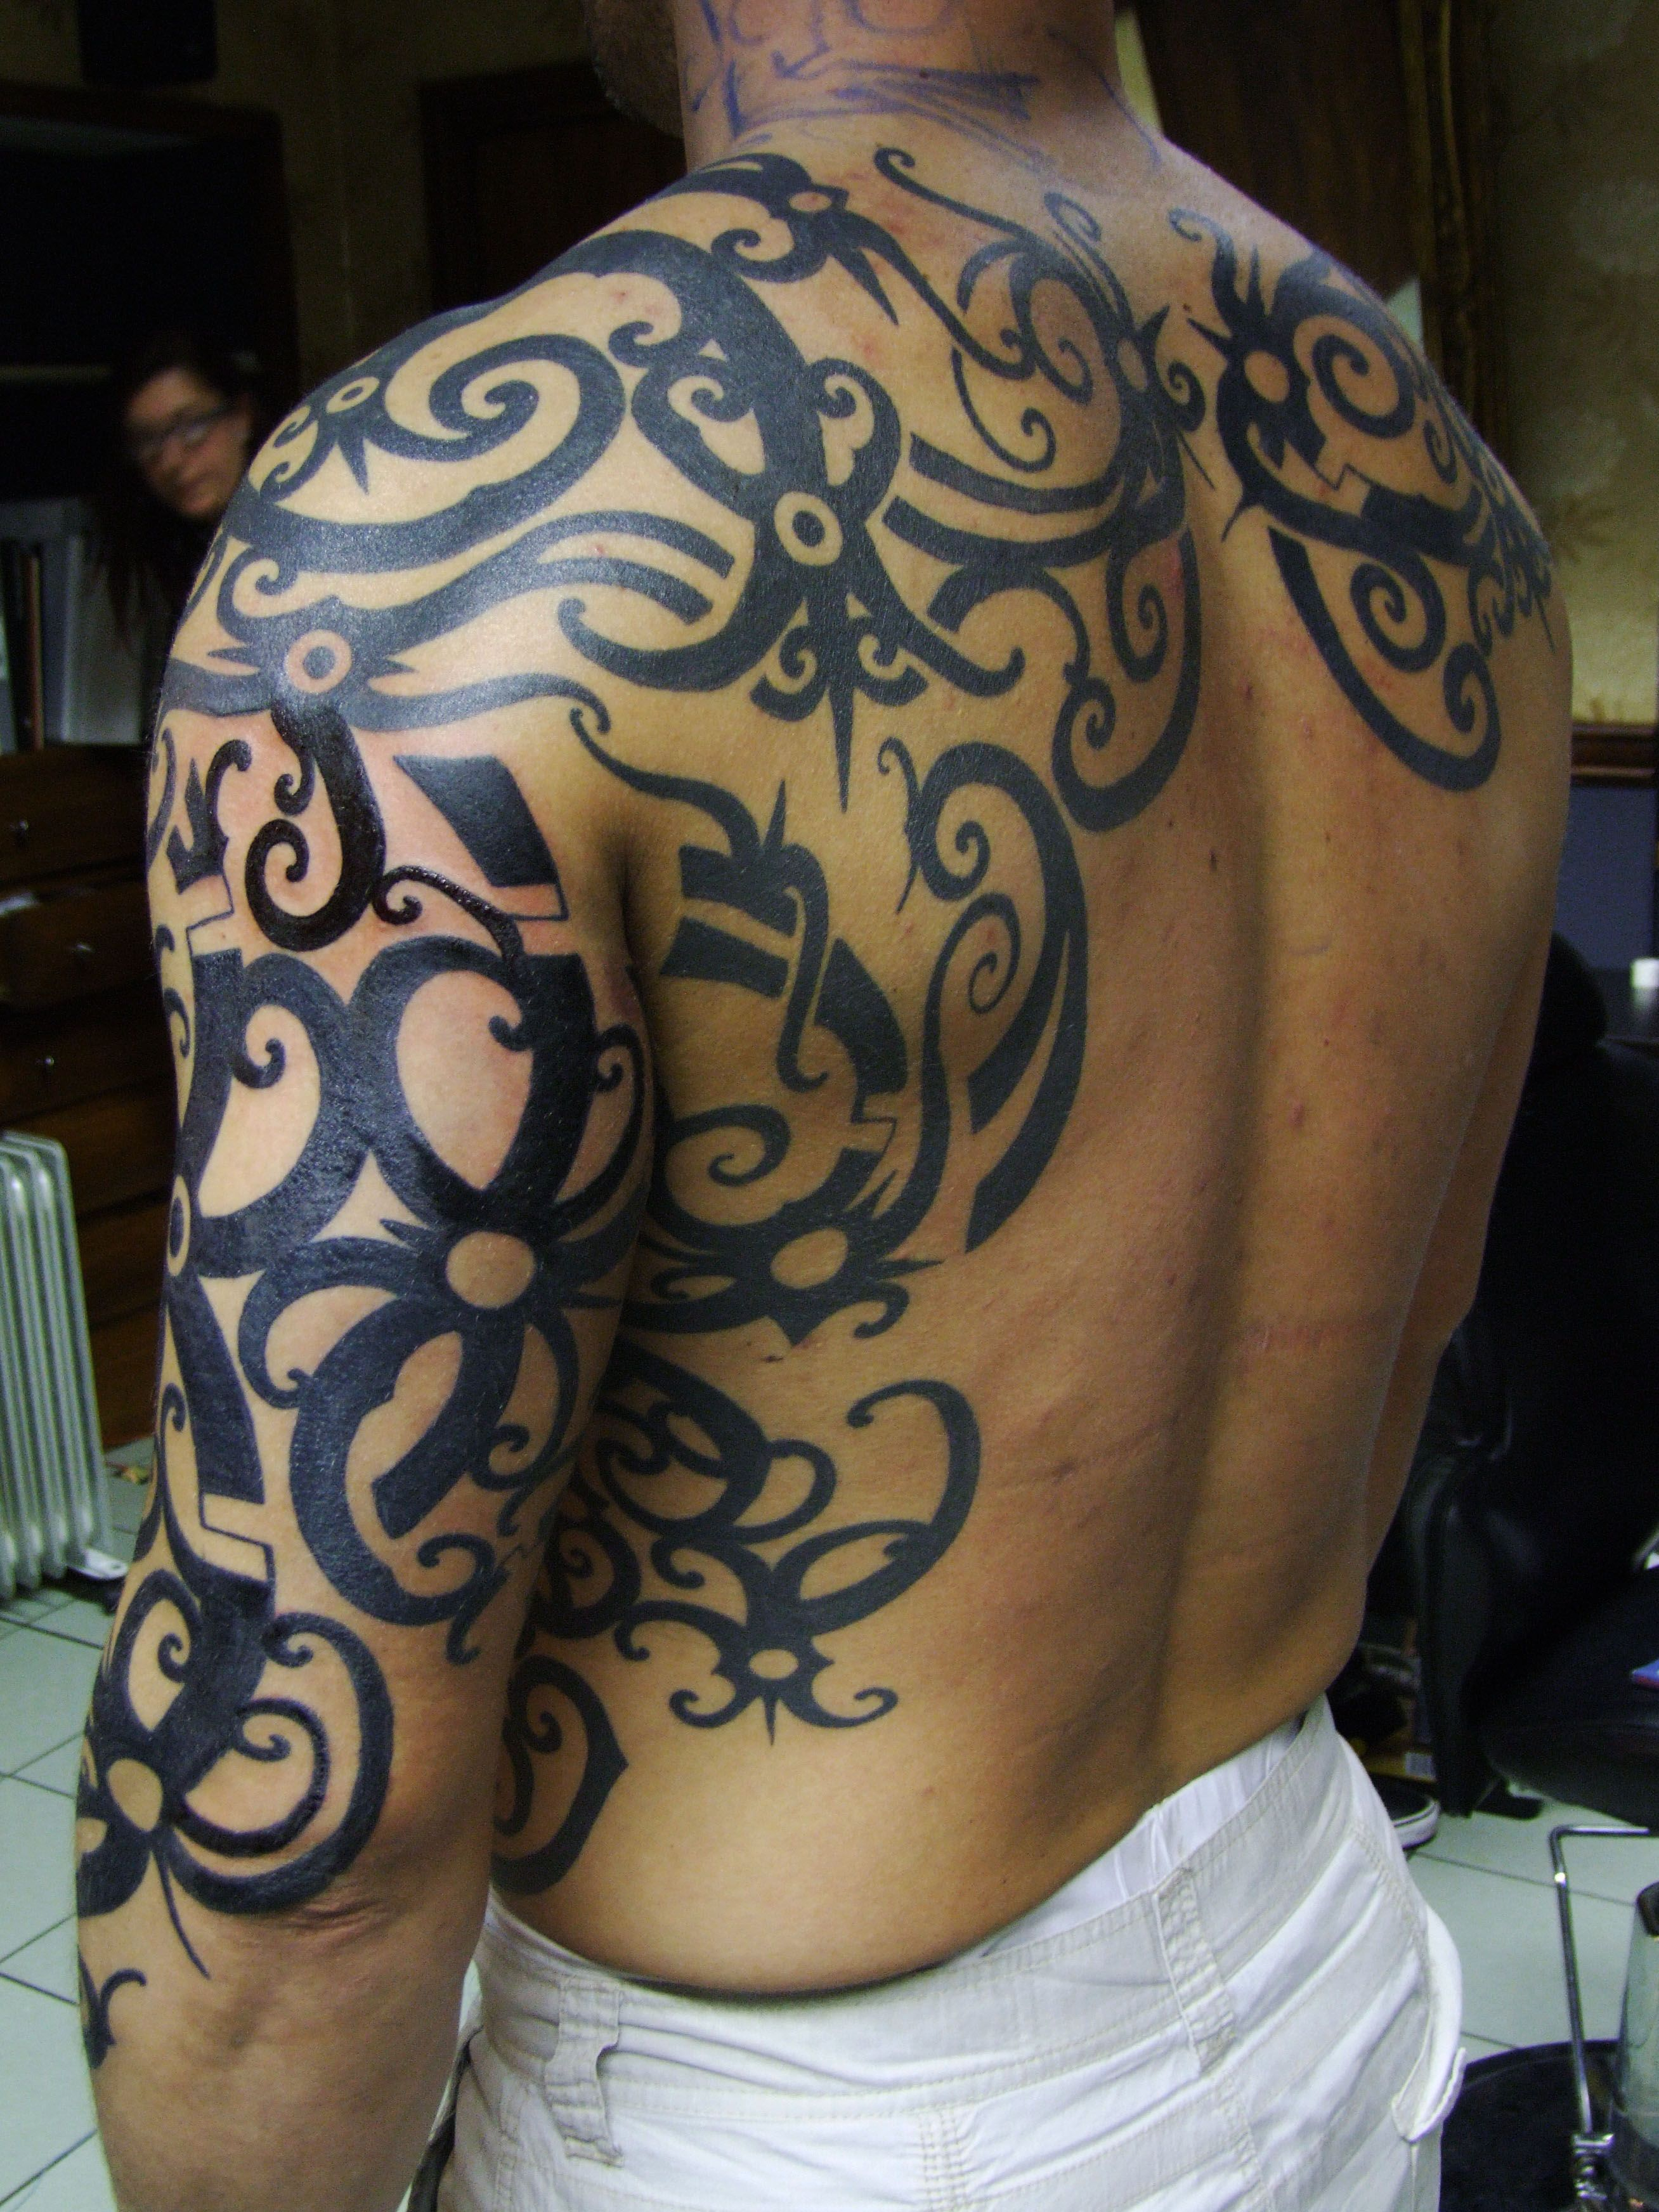 Mysterious Tribal Tattoos On Media Democracy Tribal Tattoos Tattoos Tribal Tattoos For Men